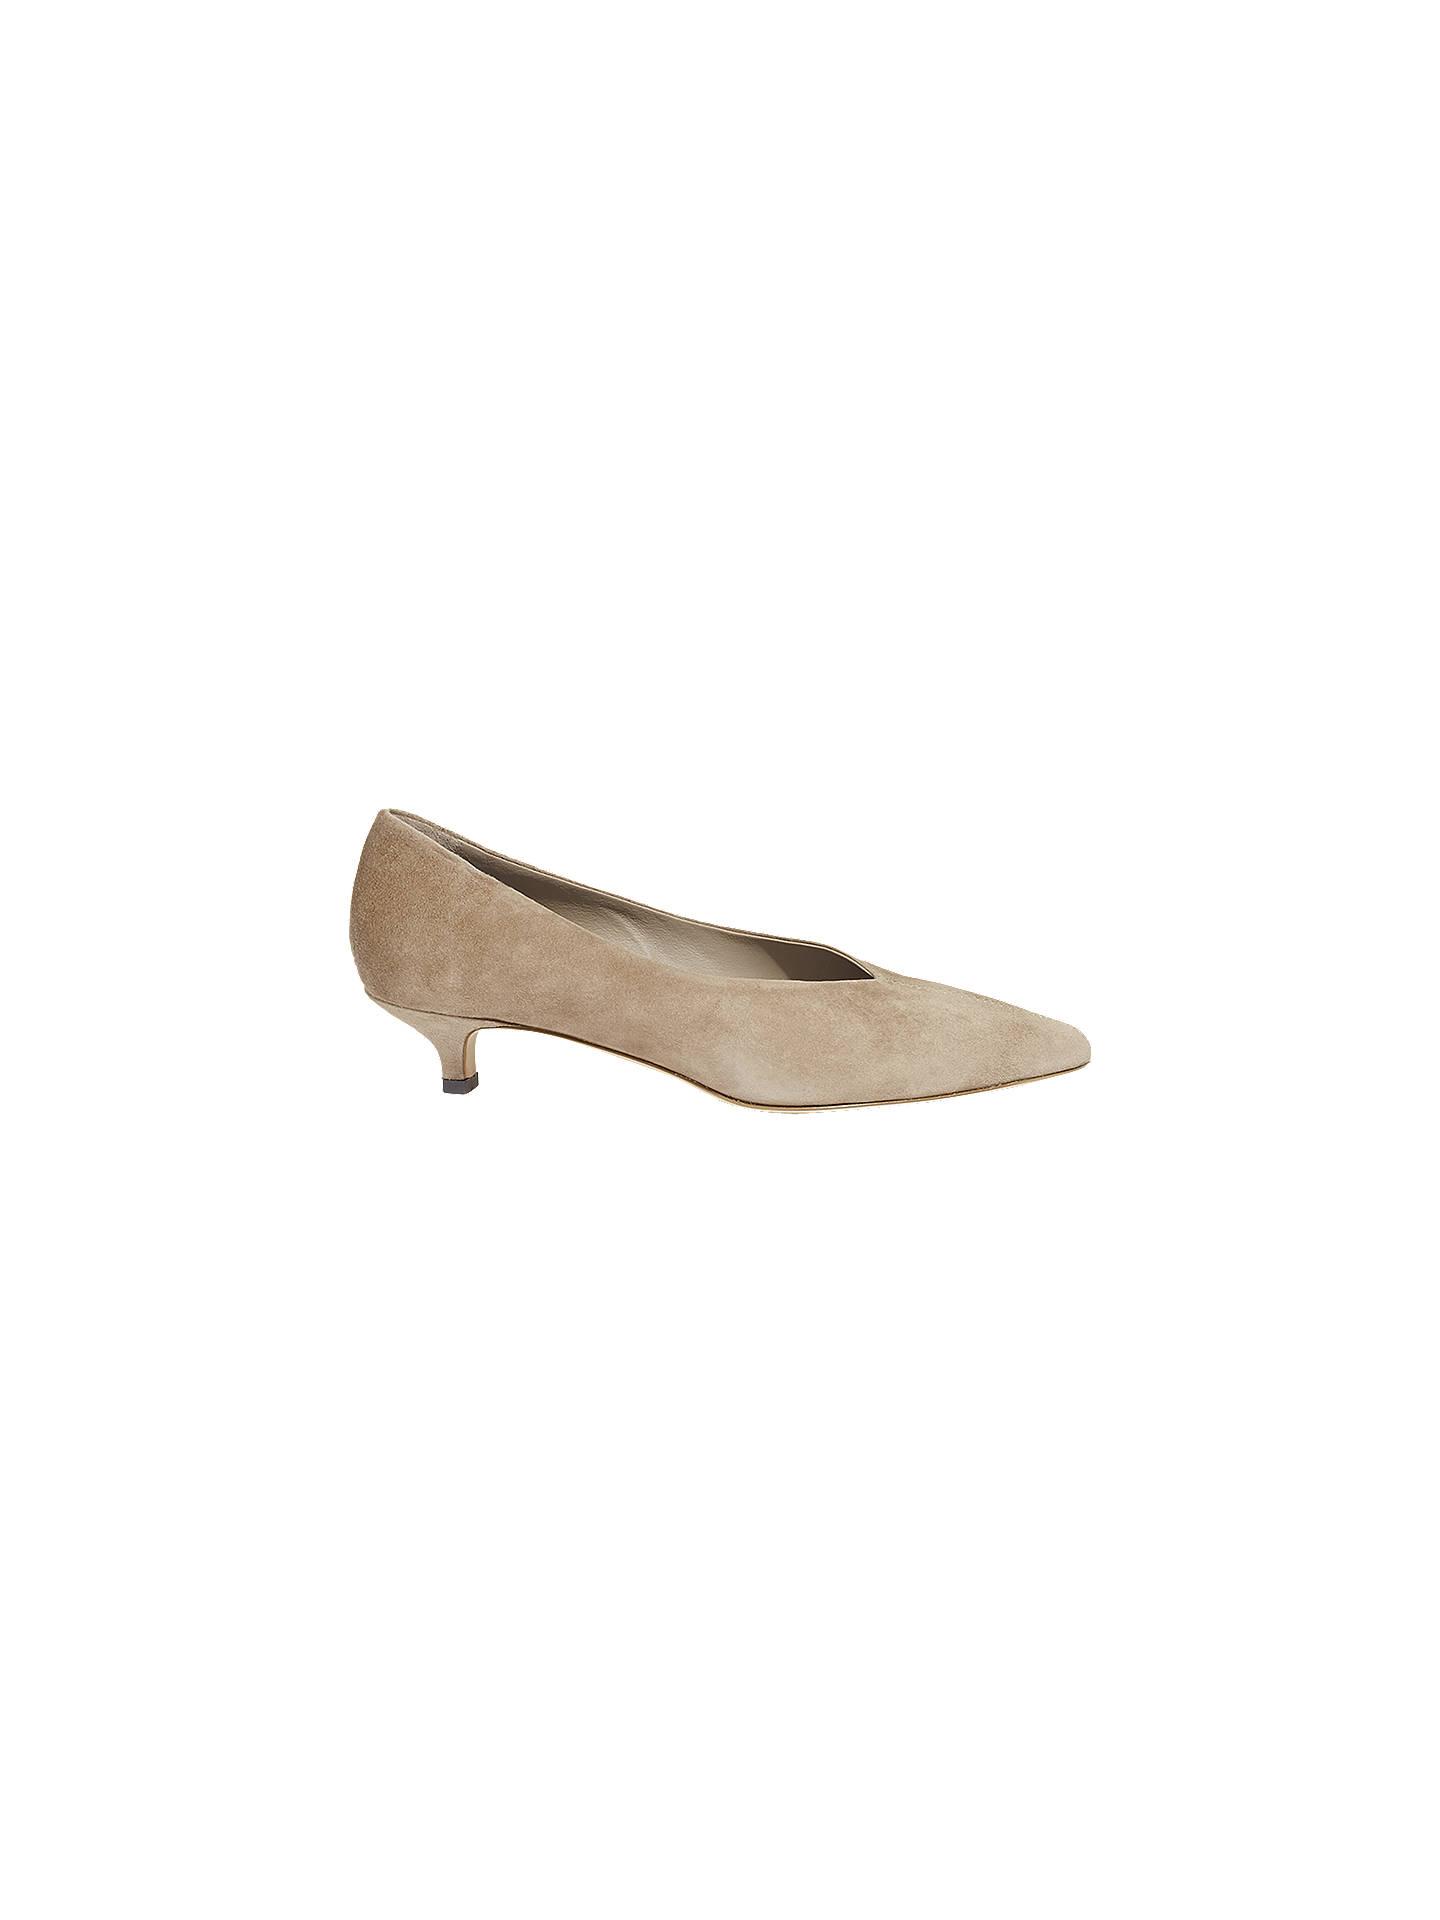 6e6bf75788f Jigsaw Felicity Kitten Heel Court Shoes at John Lewis   Partners